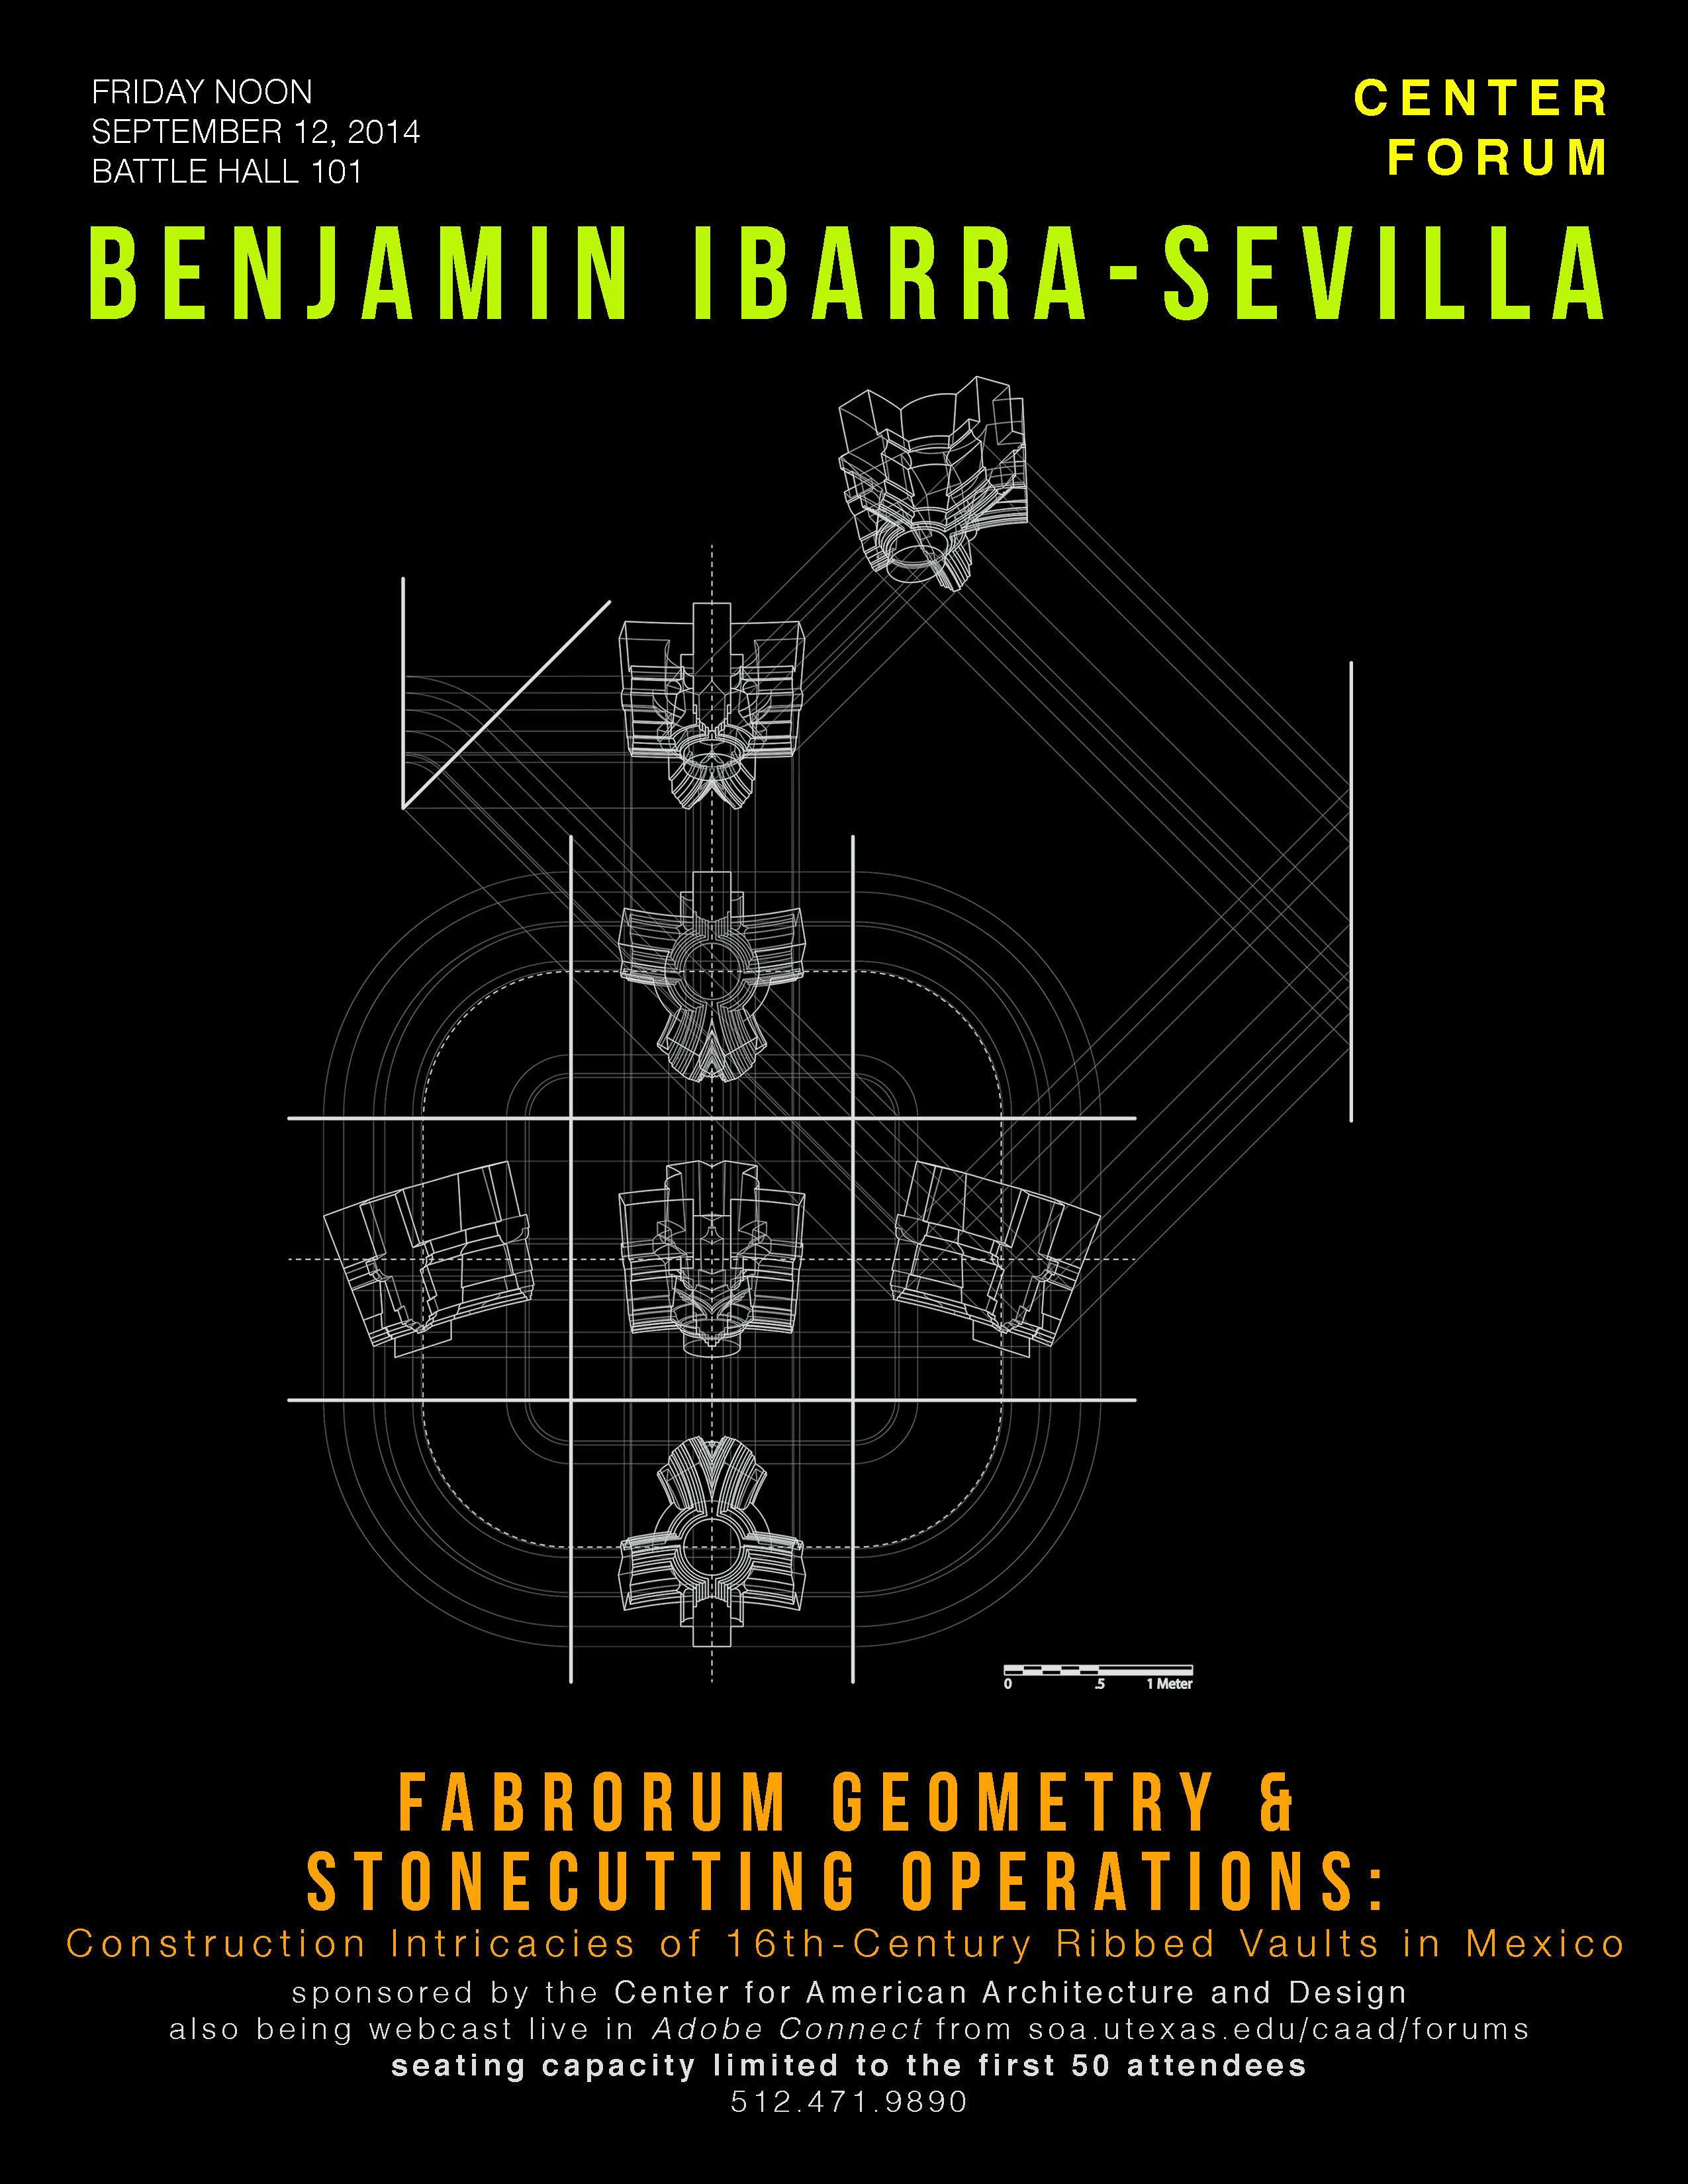 Benjamin Ibarra-Sevilla - Farborum Geometry and Stonecutting Operations